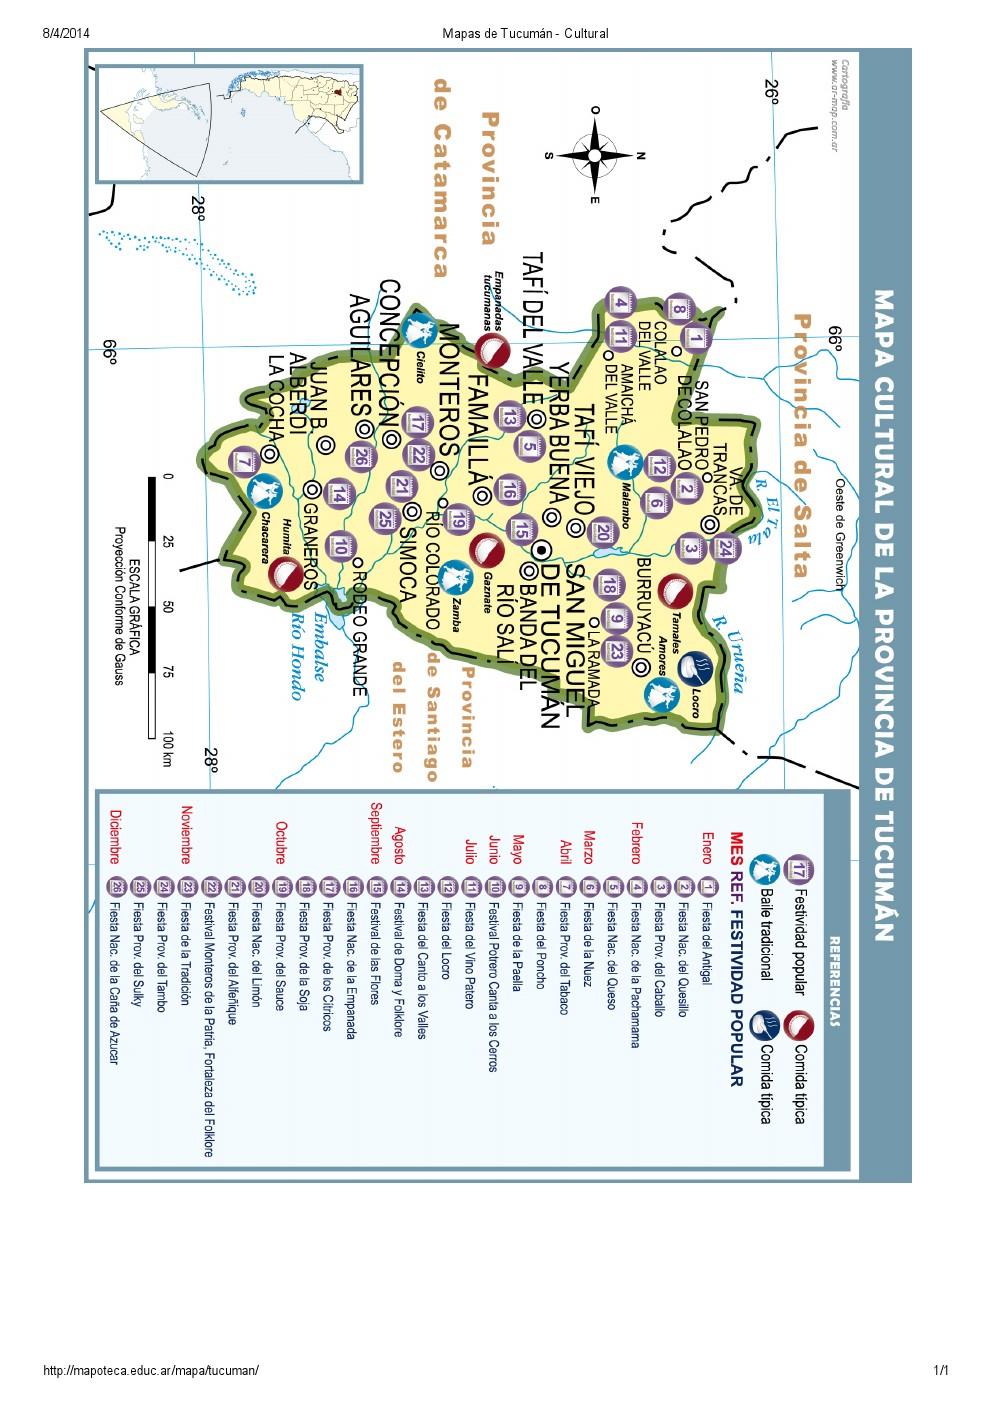 Mapa cultural de Tucumán. Mapoteca de Educ.ar